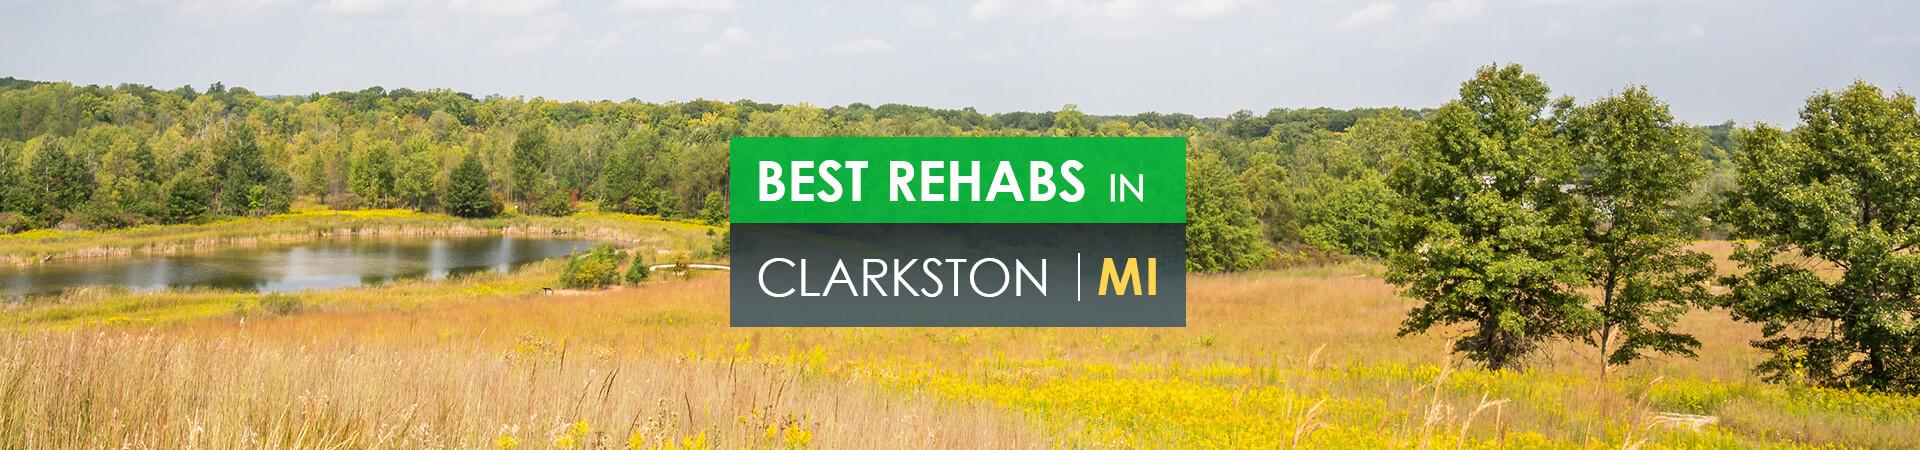 Best rehabs in Clarkston, MI